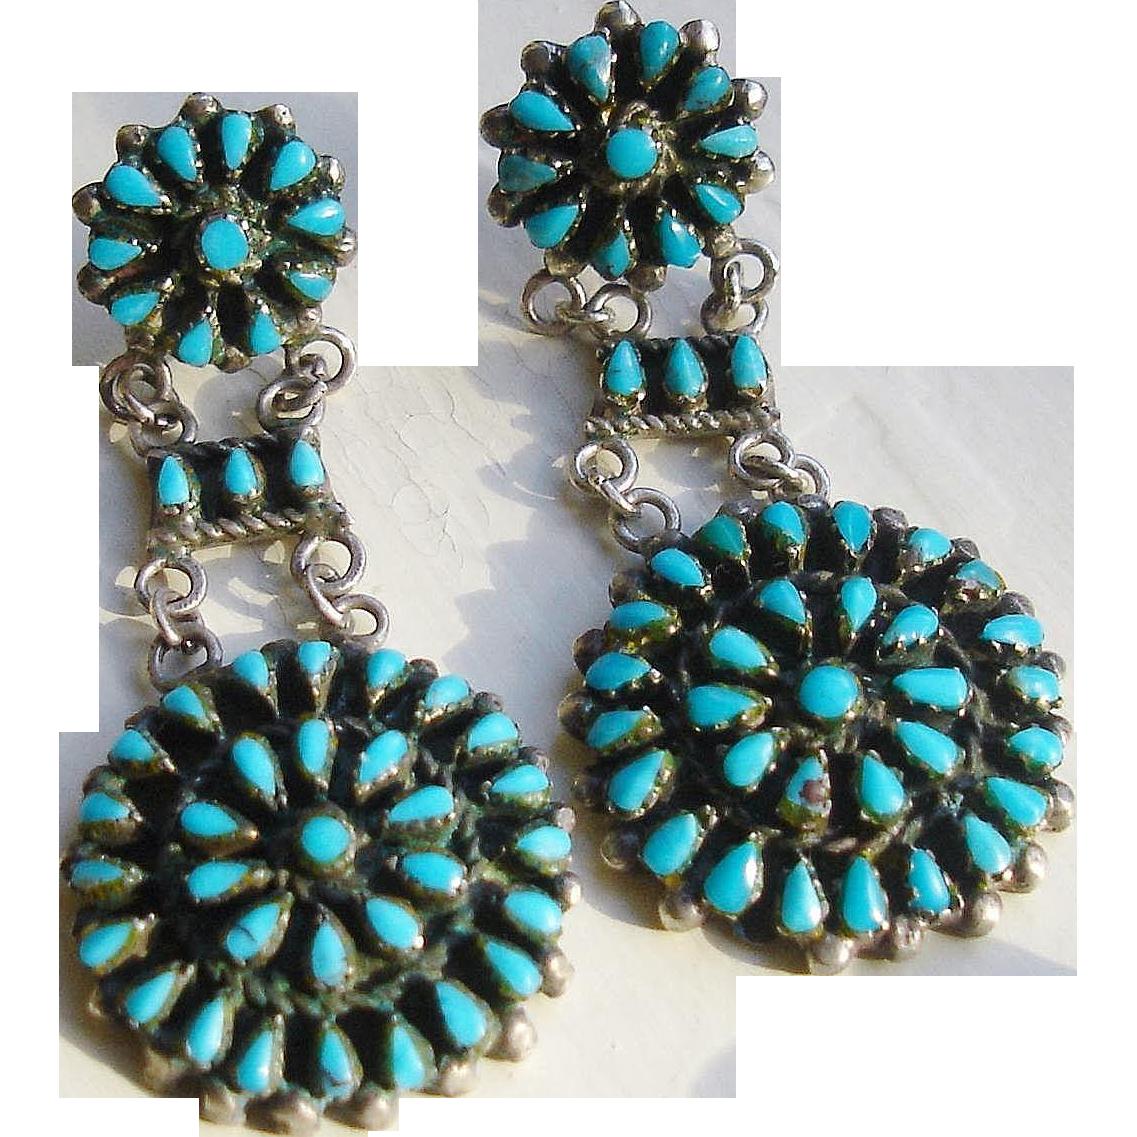 Zuni Earrings: Gorgeous Zuni Petit Point Earrings Sterling & Turquoise C